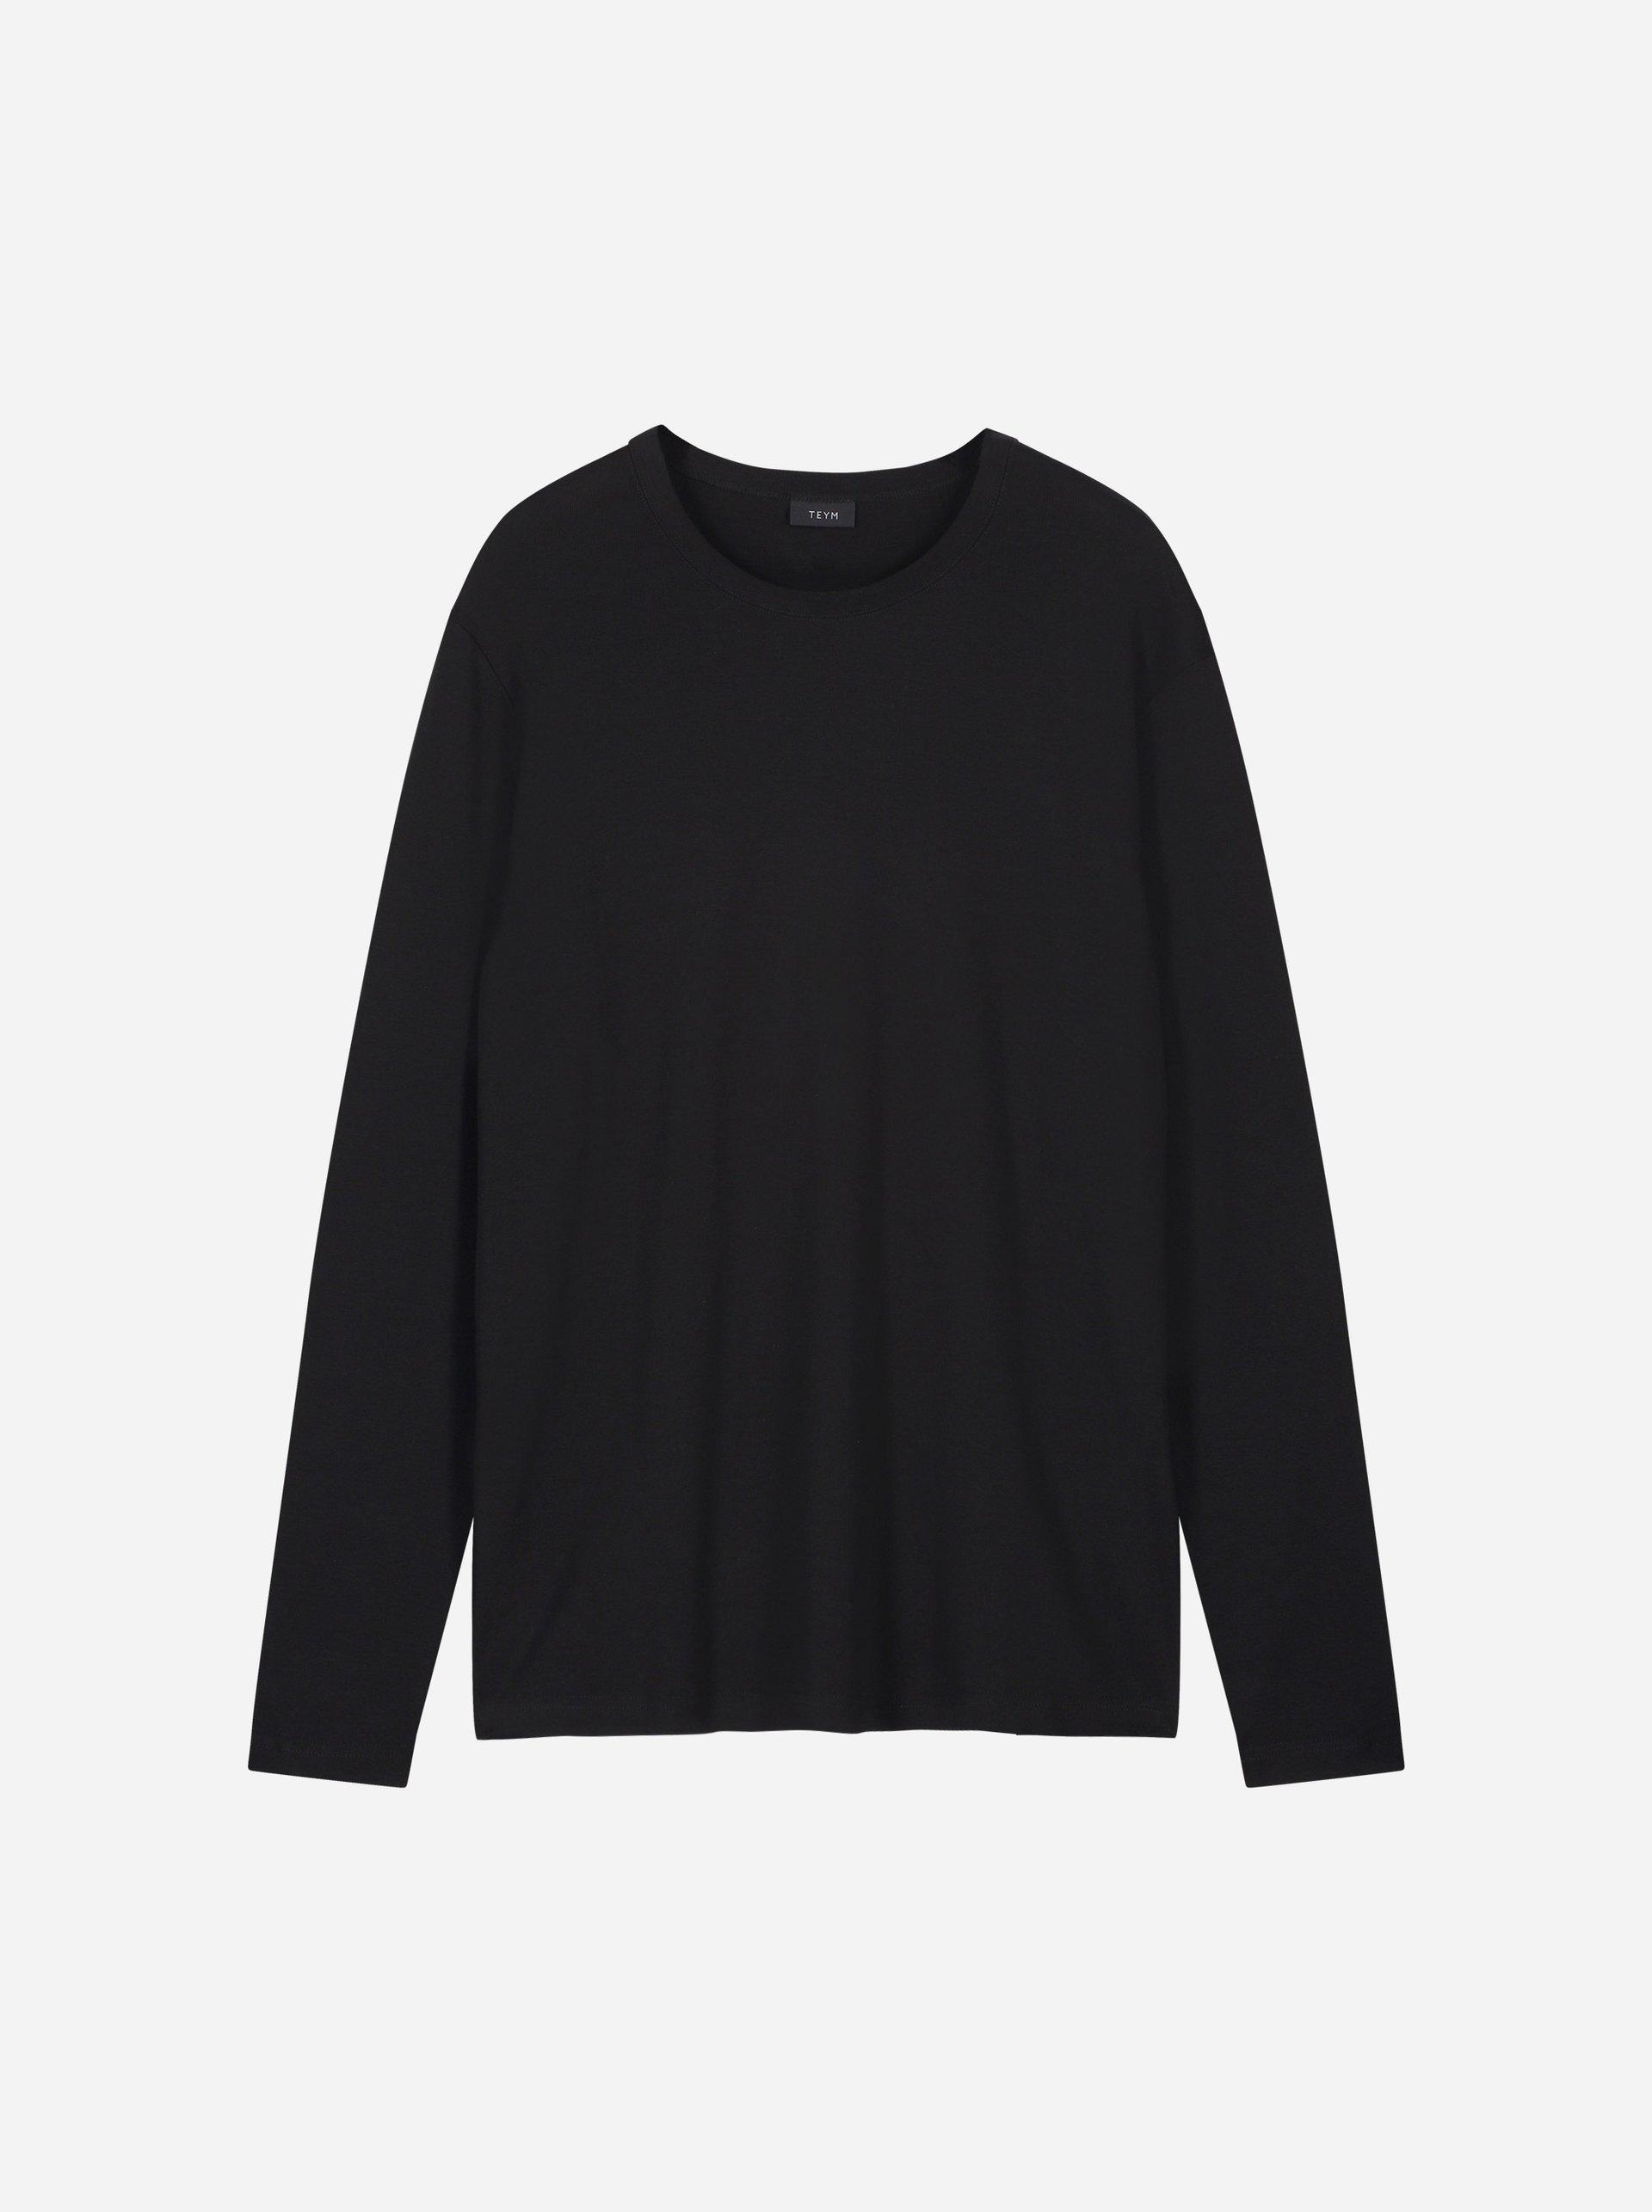 Teym - The-T-Shirt - Longsleeve - Men - Black - 4